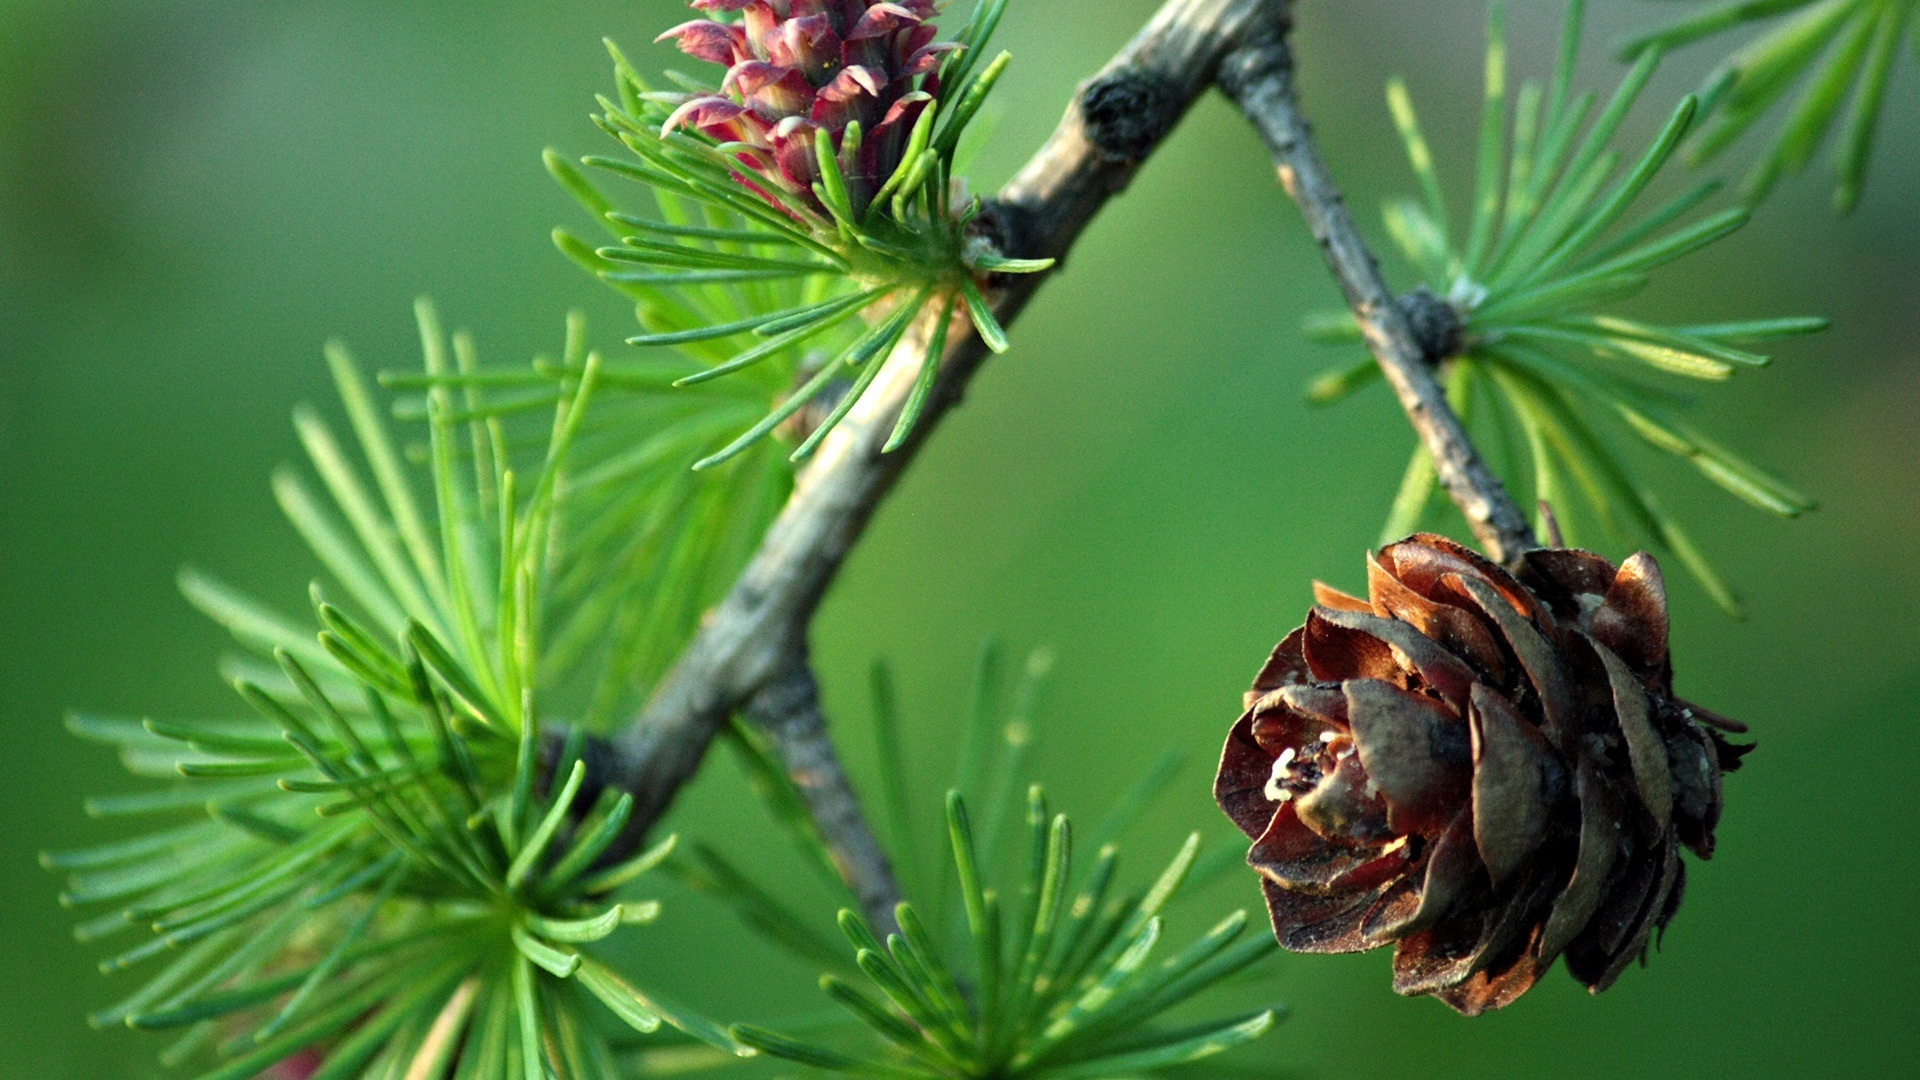 Макро сосна дерево зееное подборки